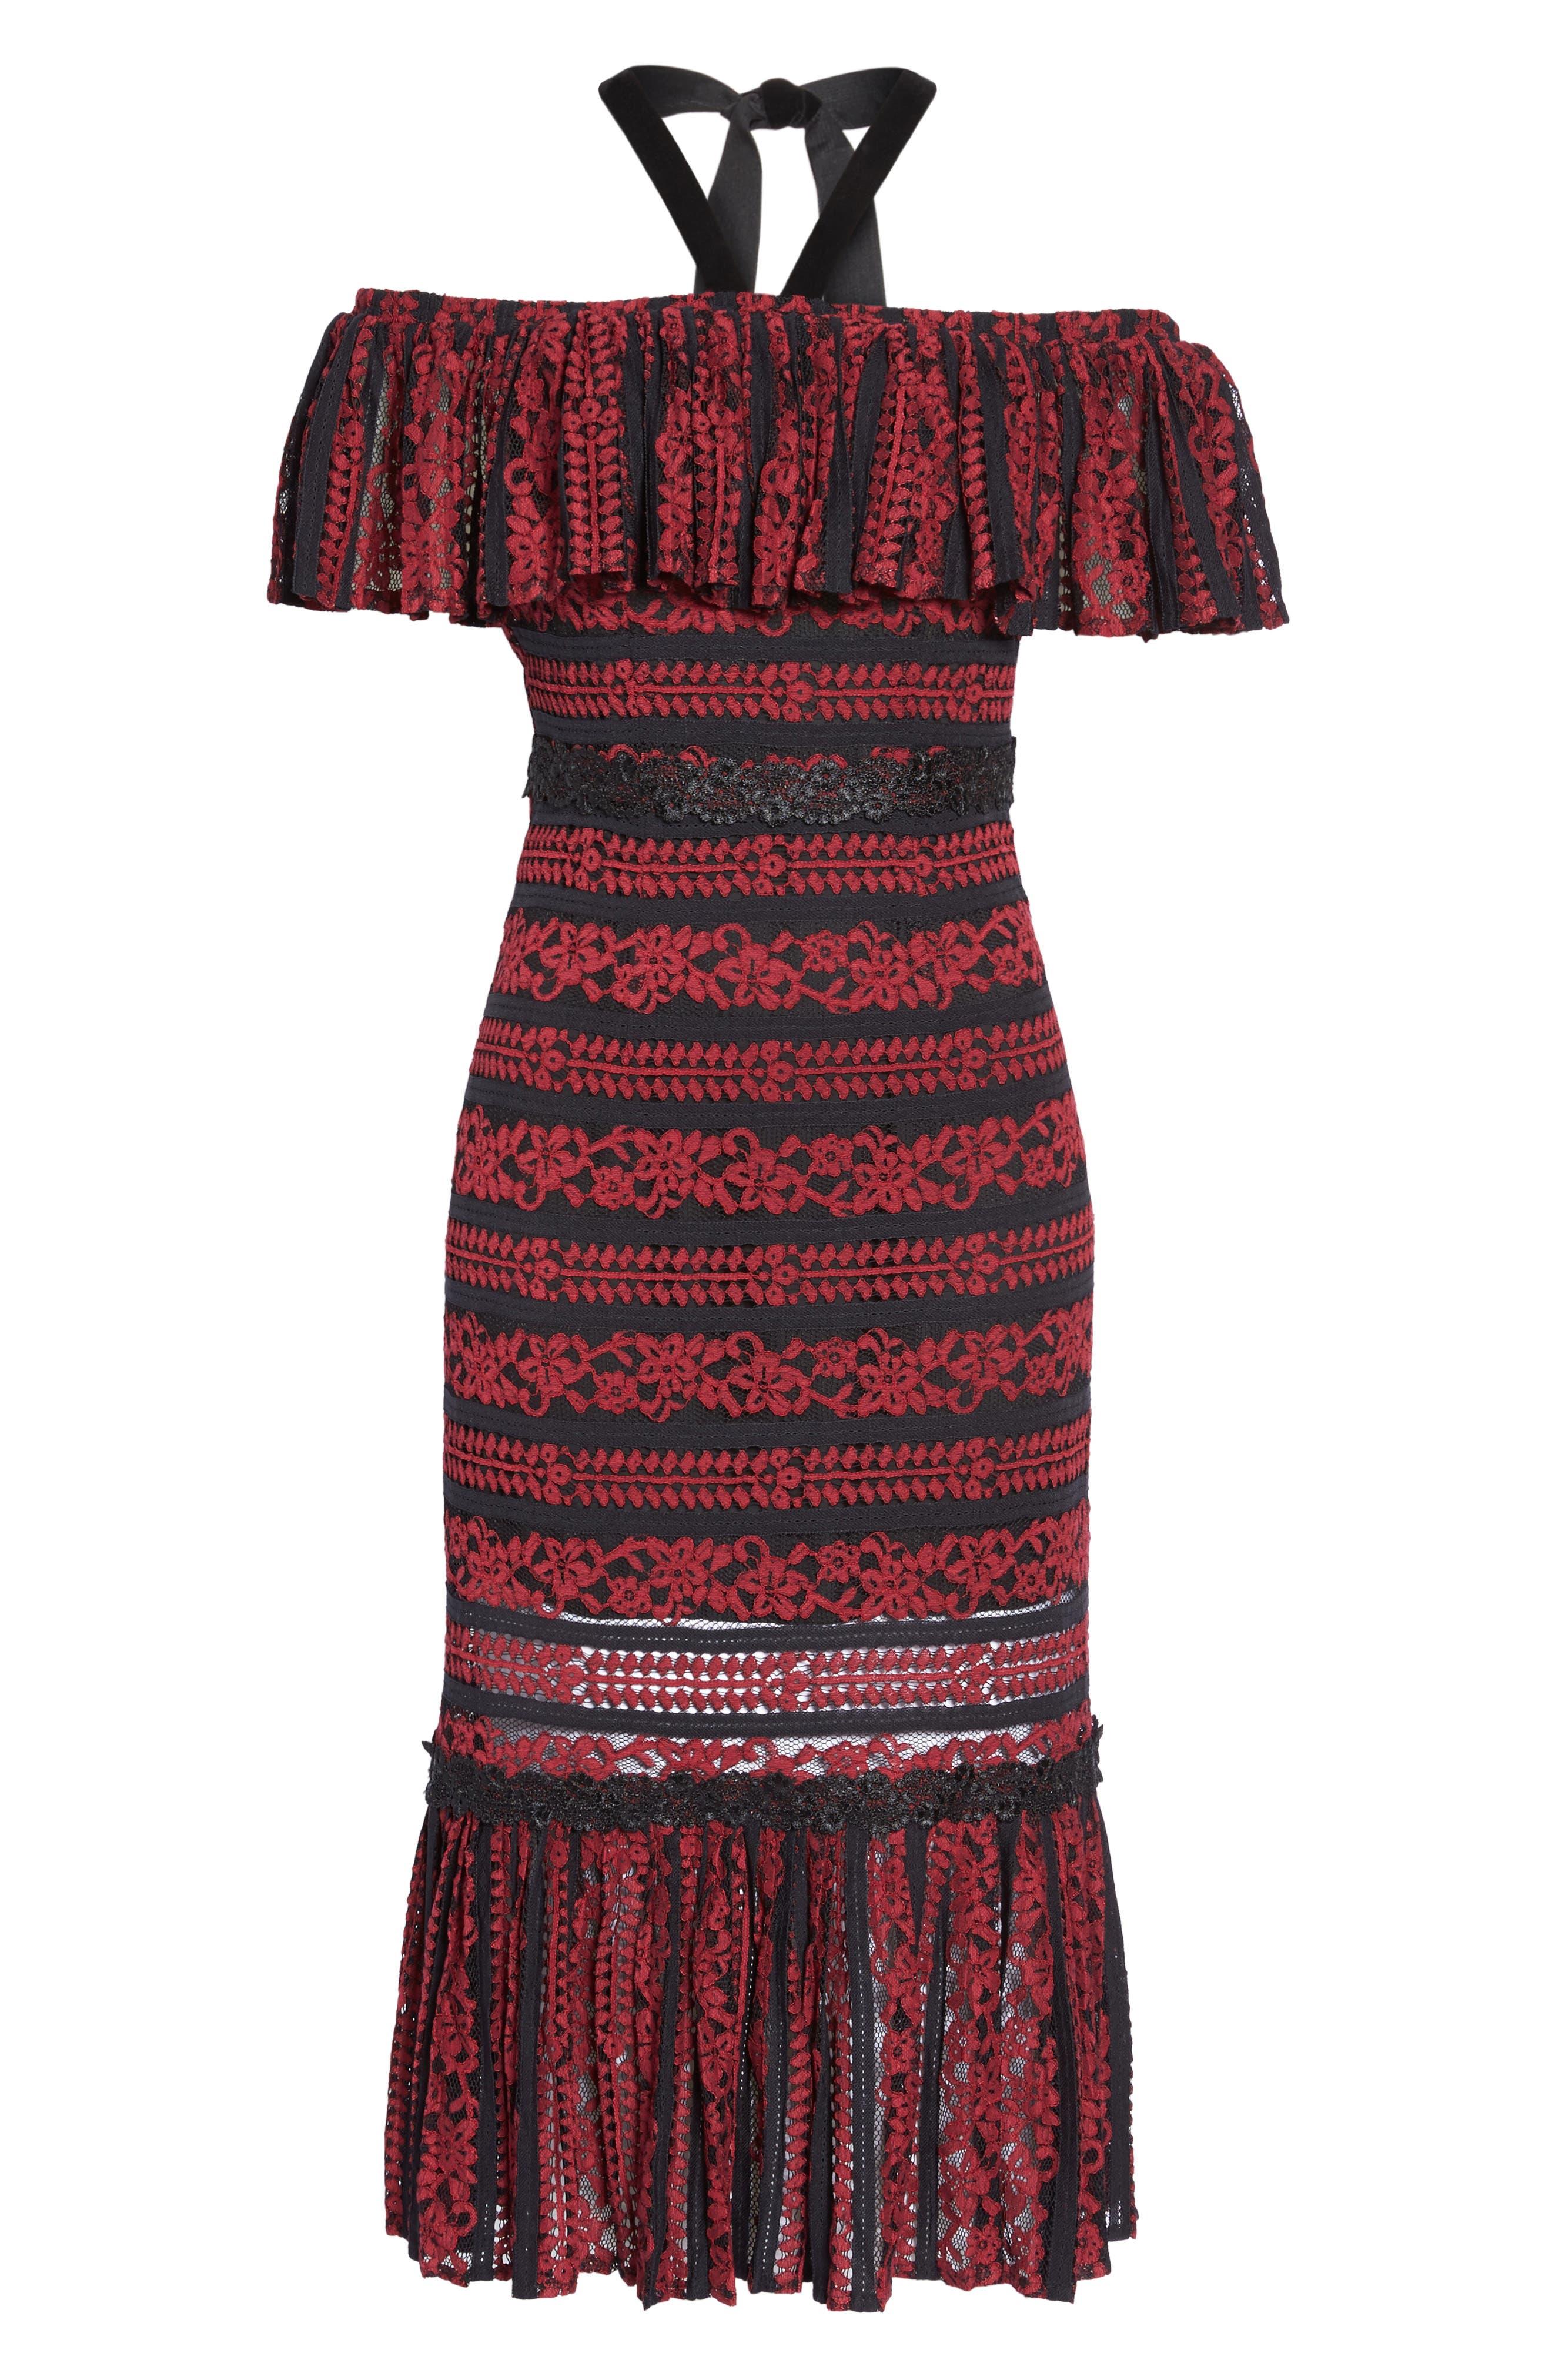 Stella Off the Shoulder Lace Midi Dress,                             Alternate thumbnail 6, color,                             649